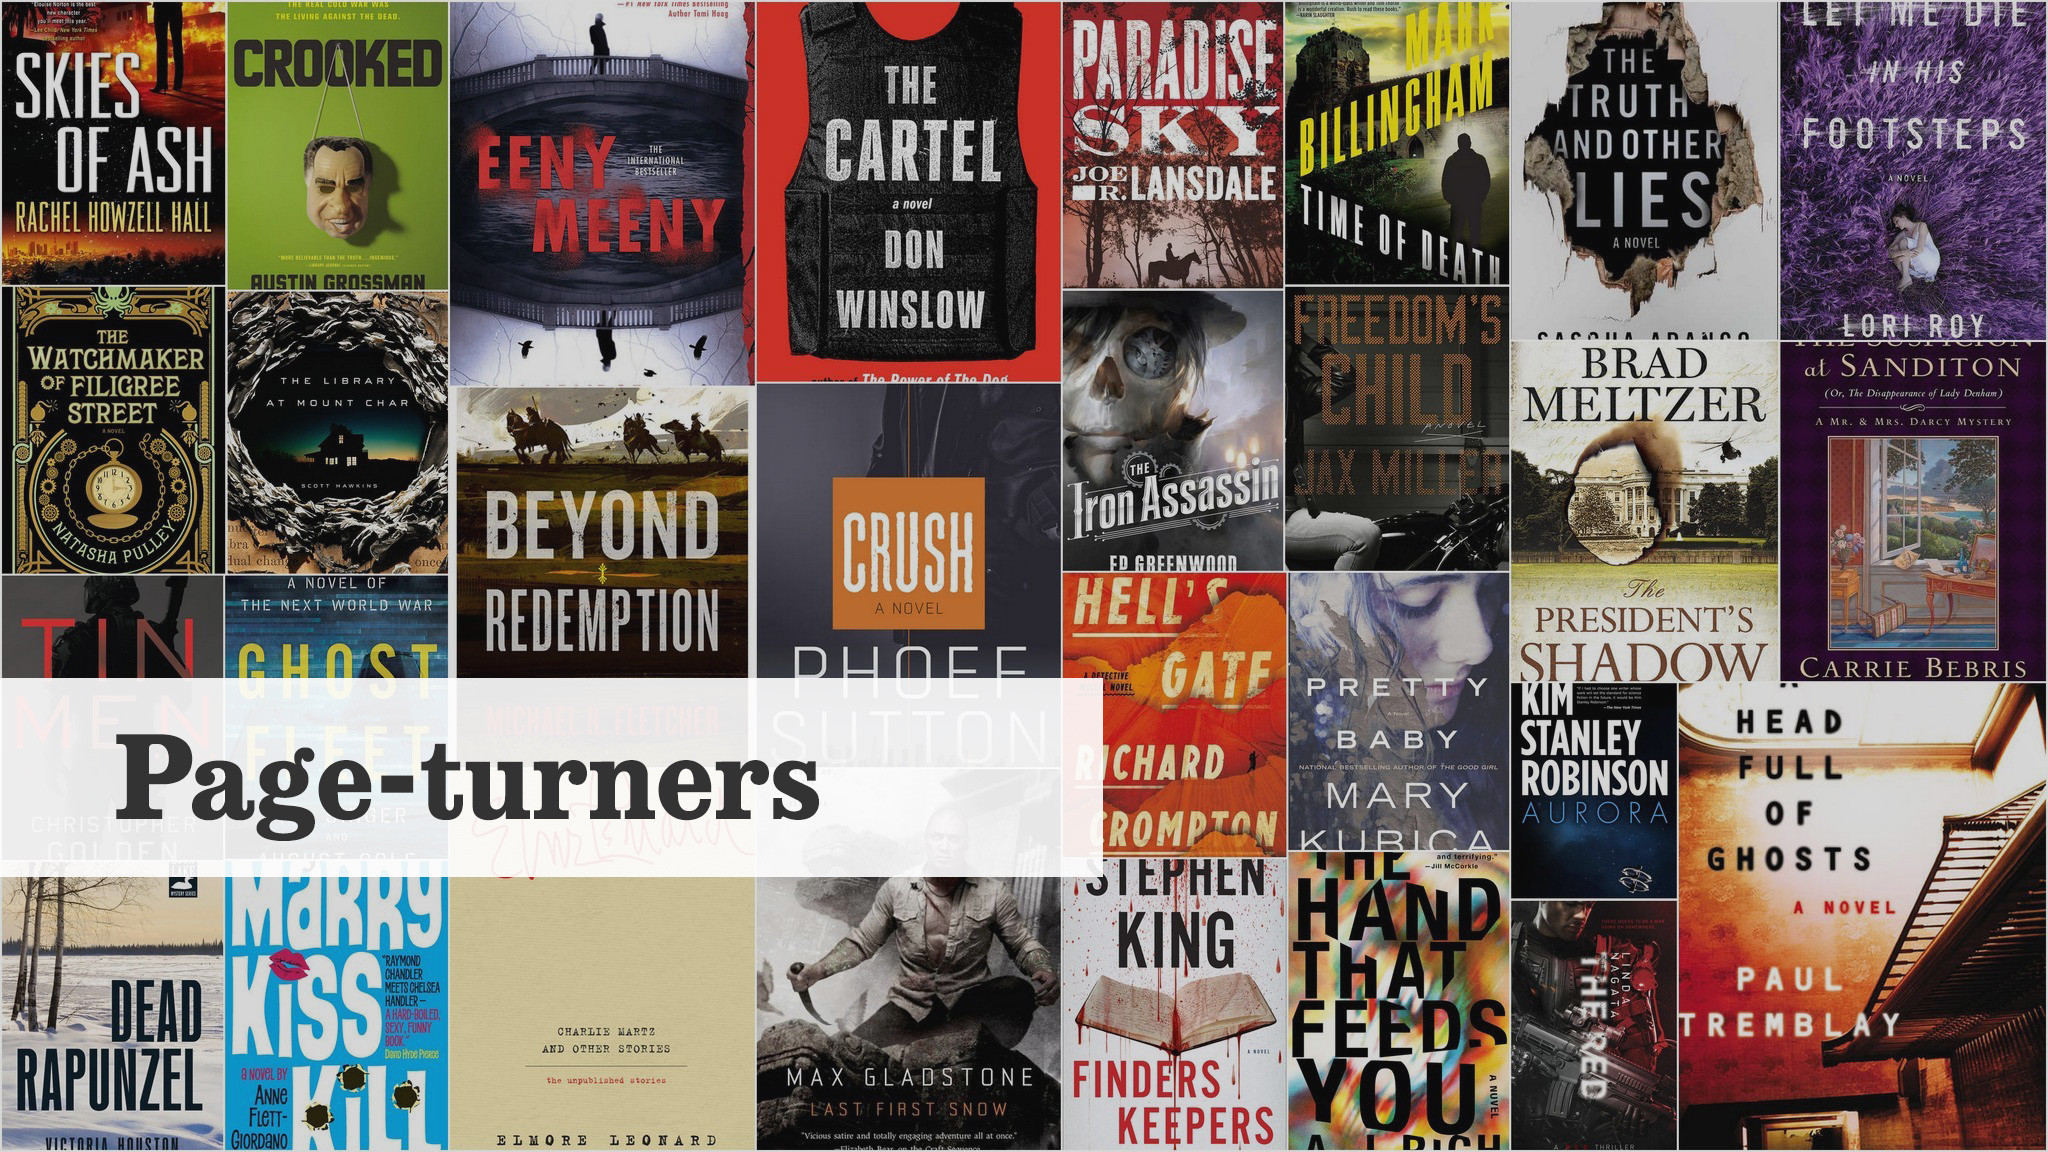 page-turners